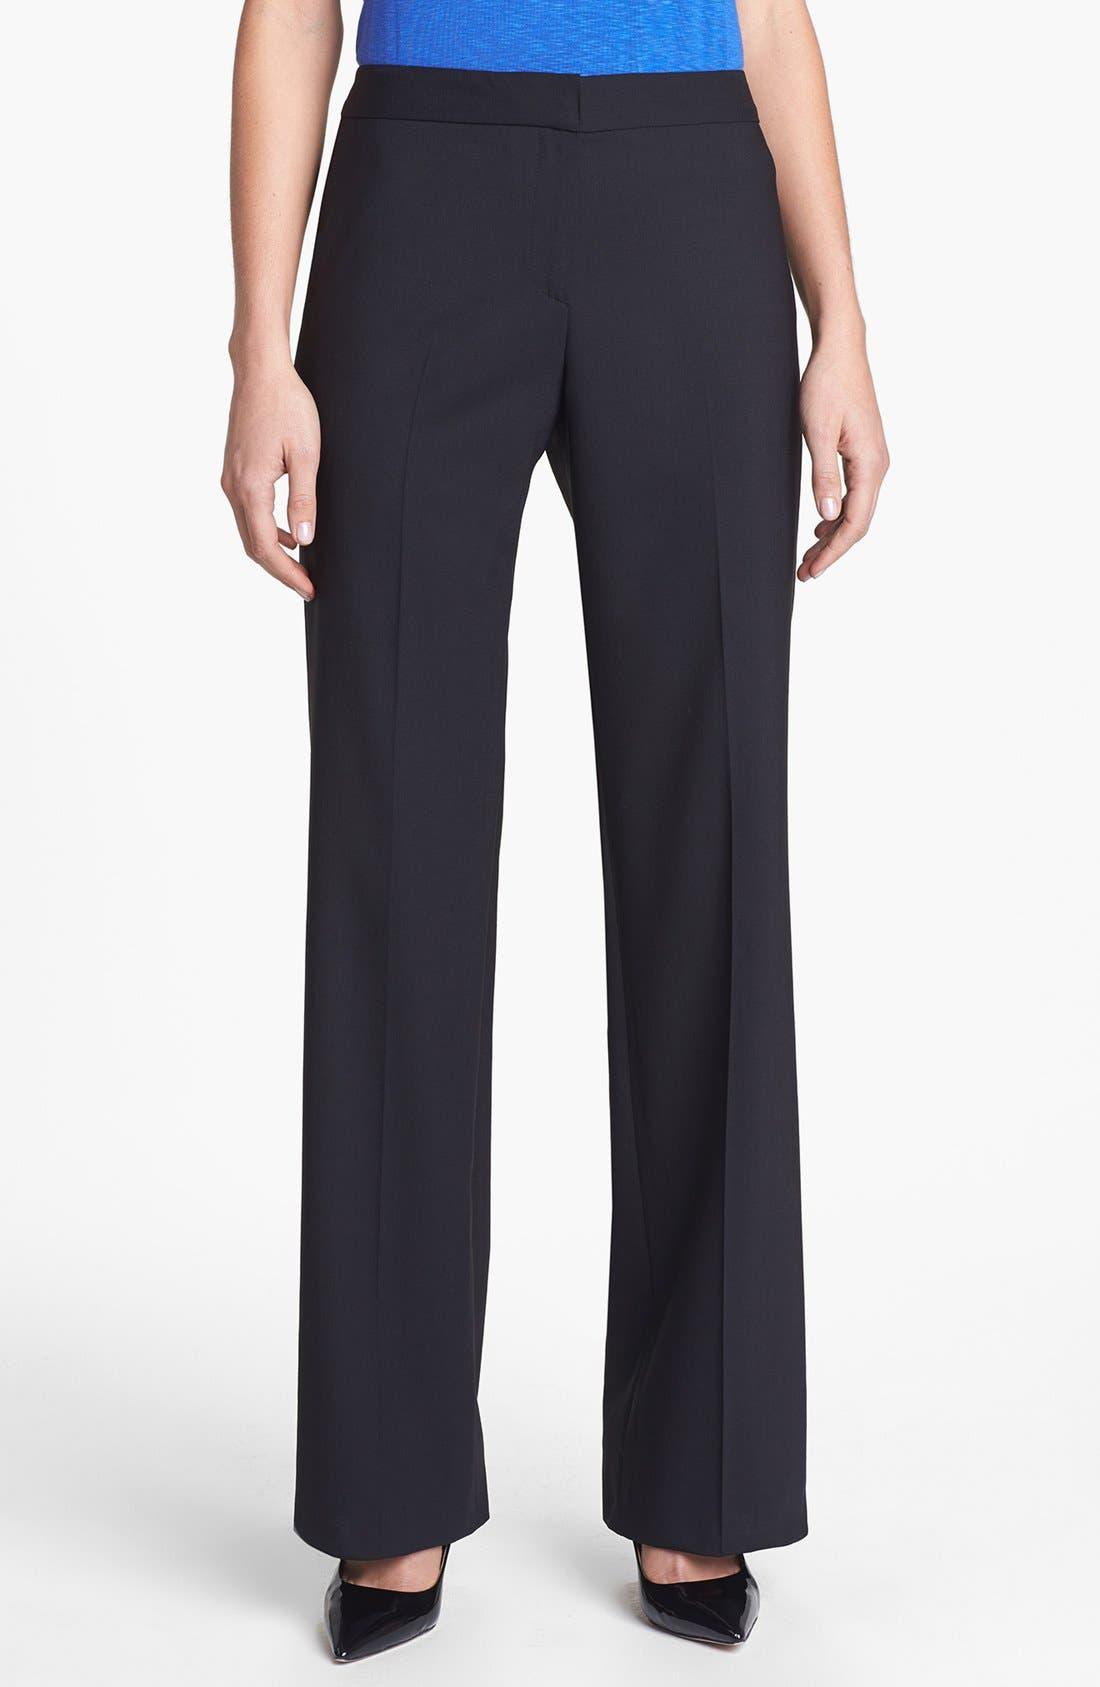 Alternate Image 1 Selected - Santorelli 'Mara' Stretch Wool Trousers